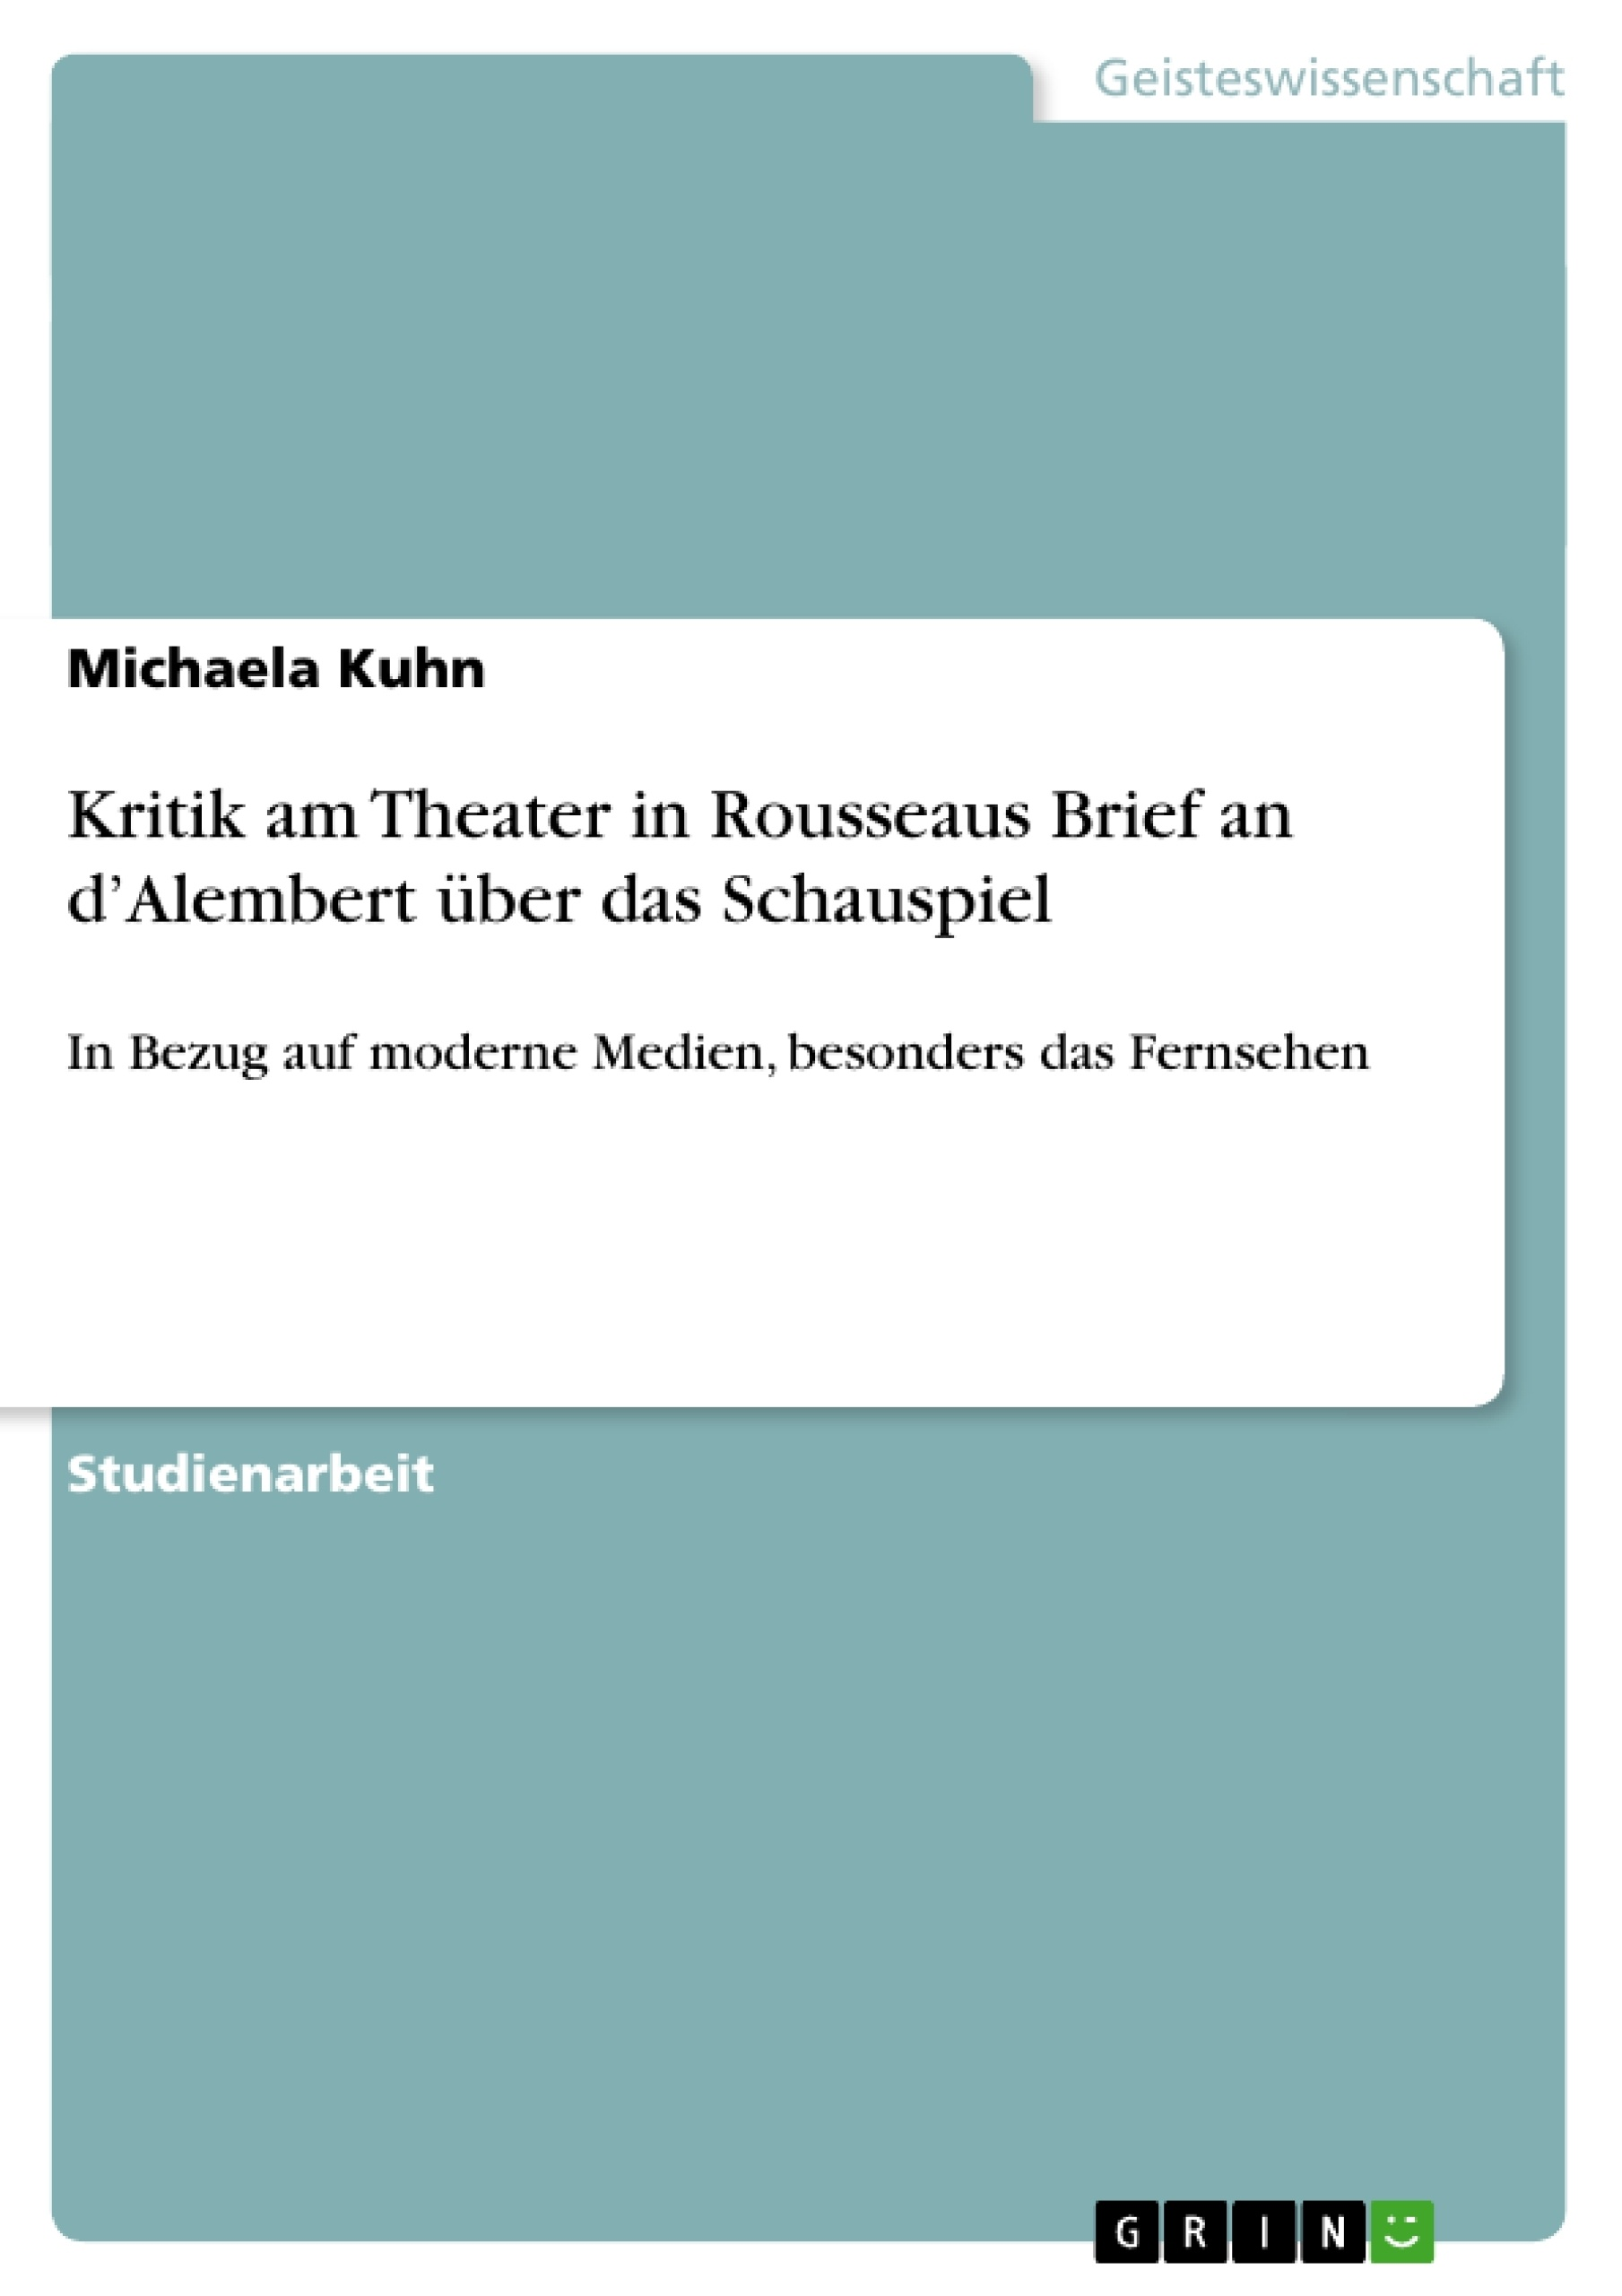 Titel: Kritik am Theater in Rousseaus Brief an d'Alembert über das Schauspiel